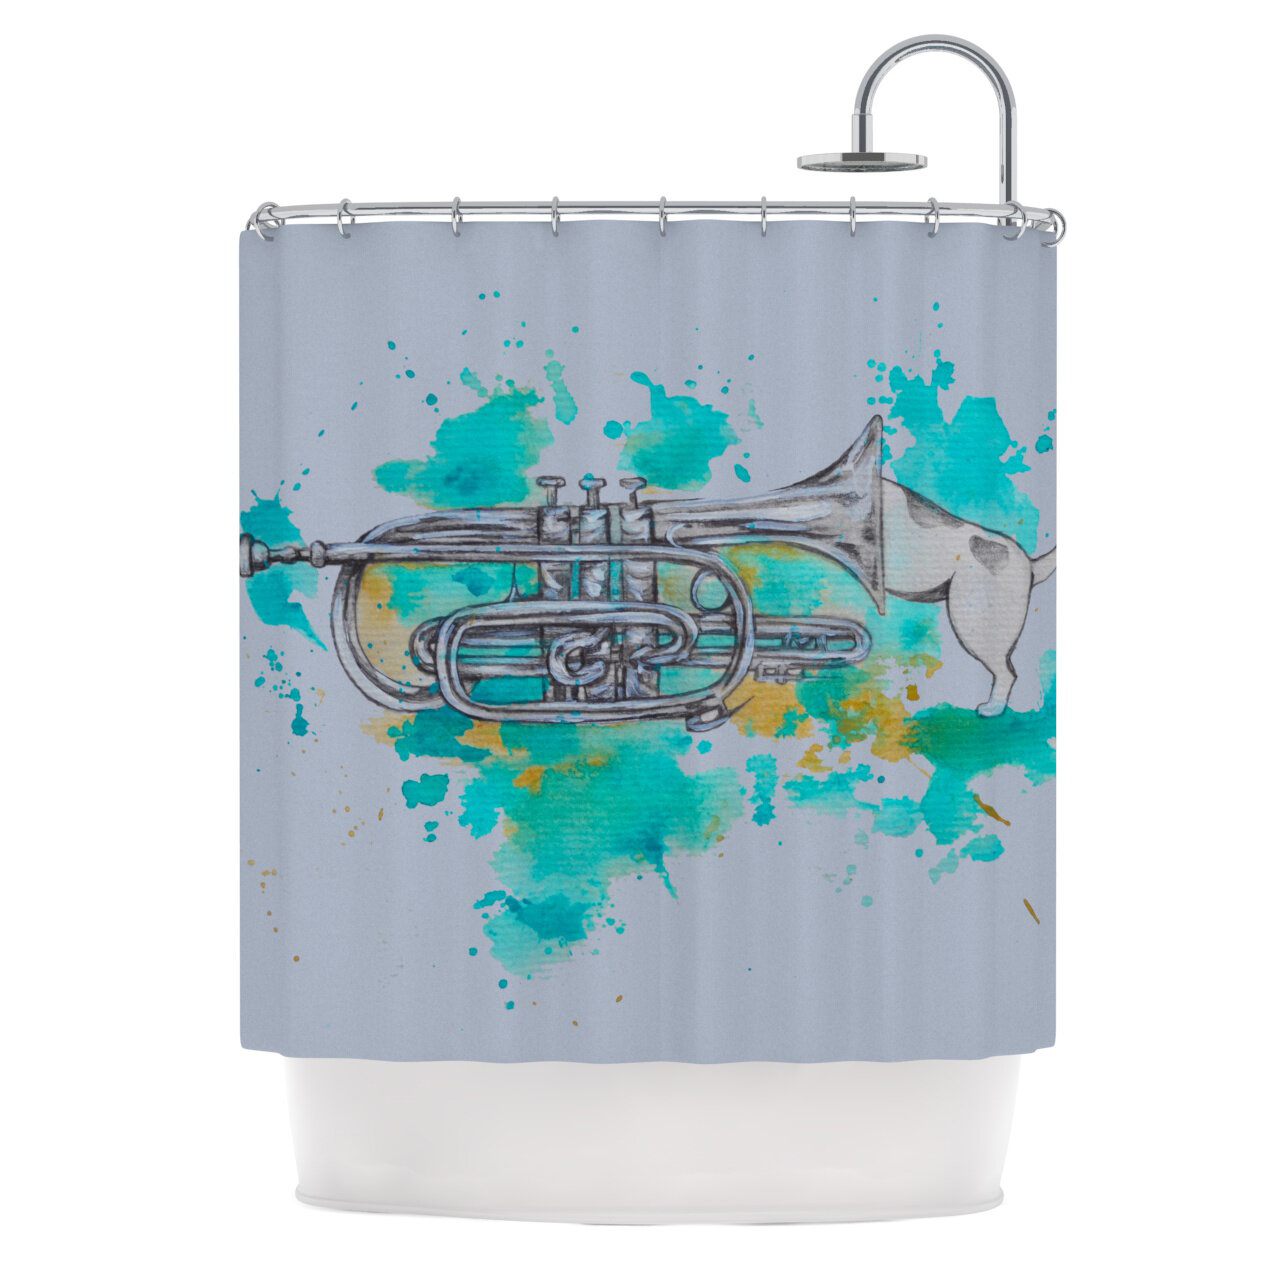 KESS InHouse Hunting for Jazz Shower Curtain & Reviews | Wayfair